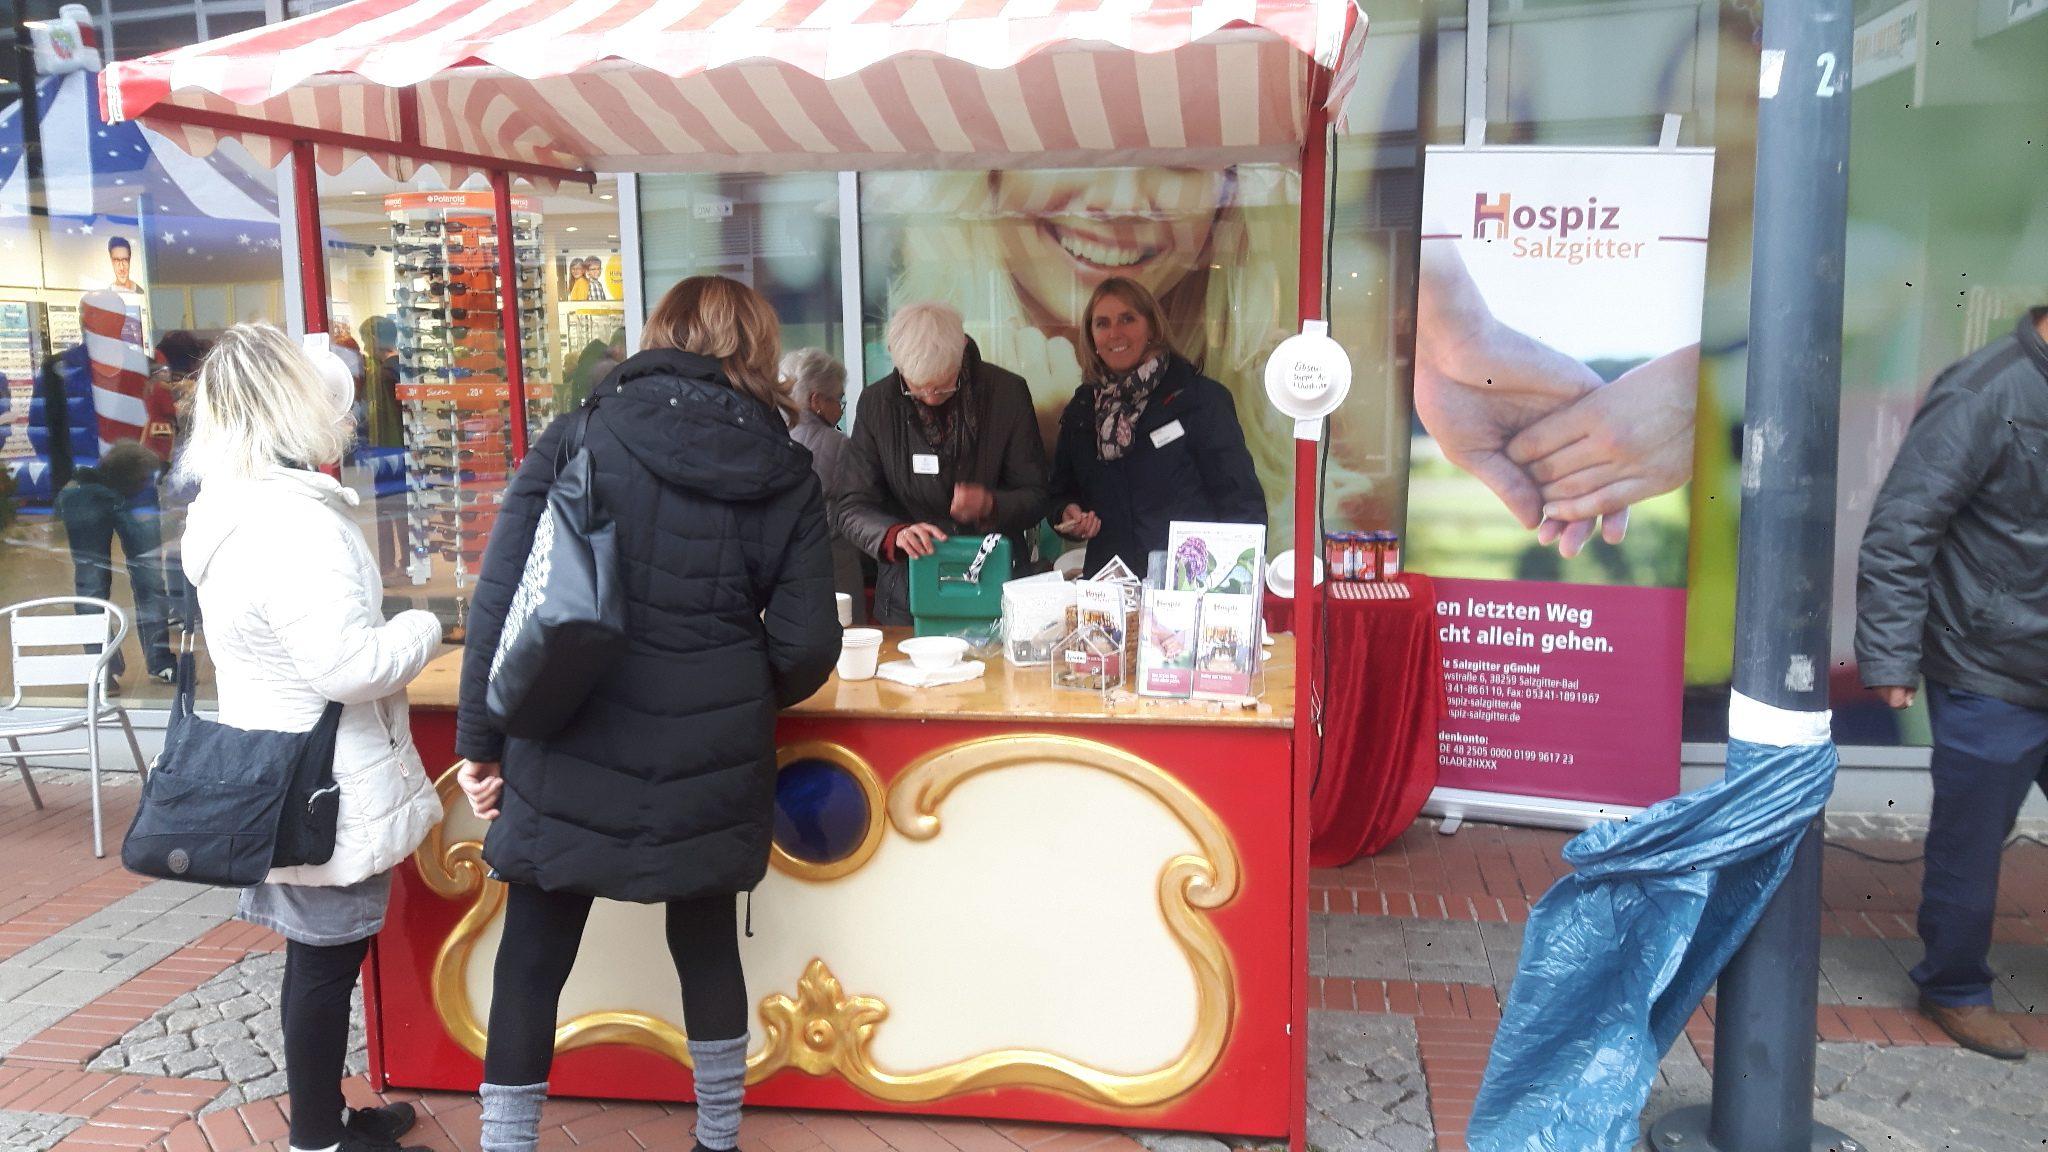 Hospiz Salzgitter Suppenverkauf